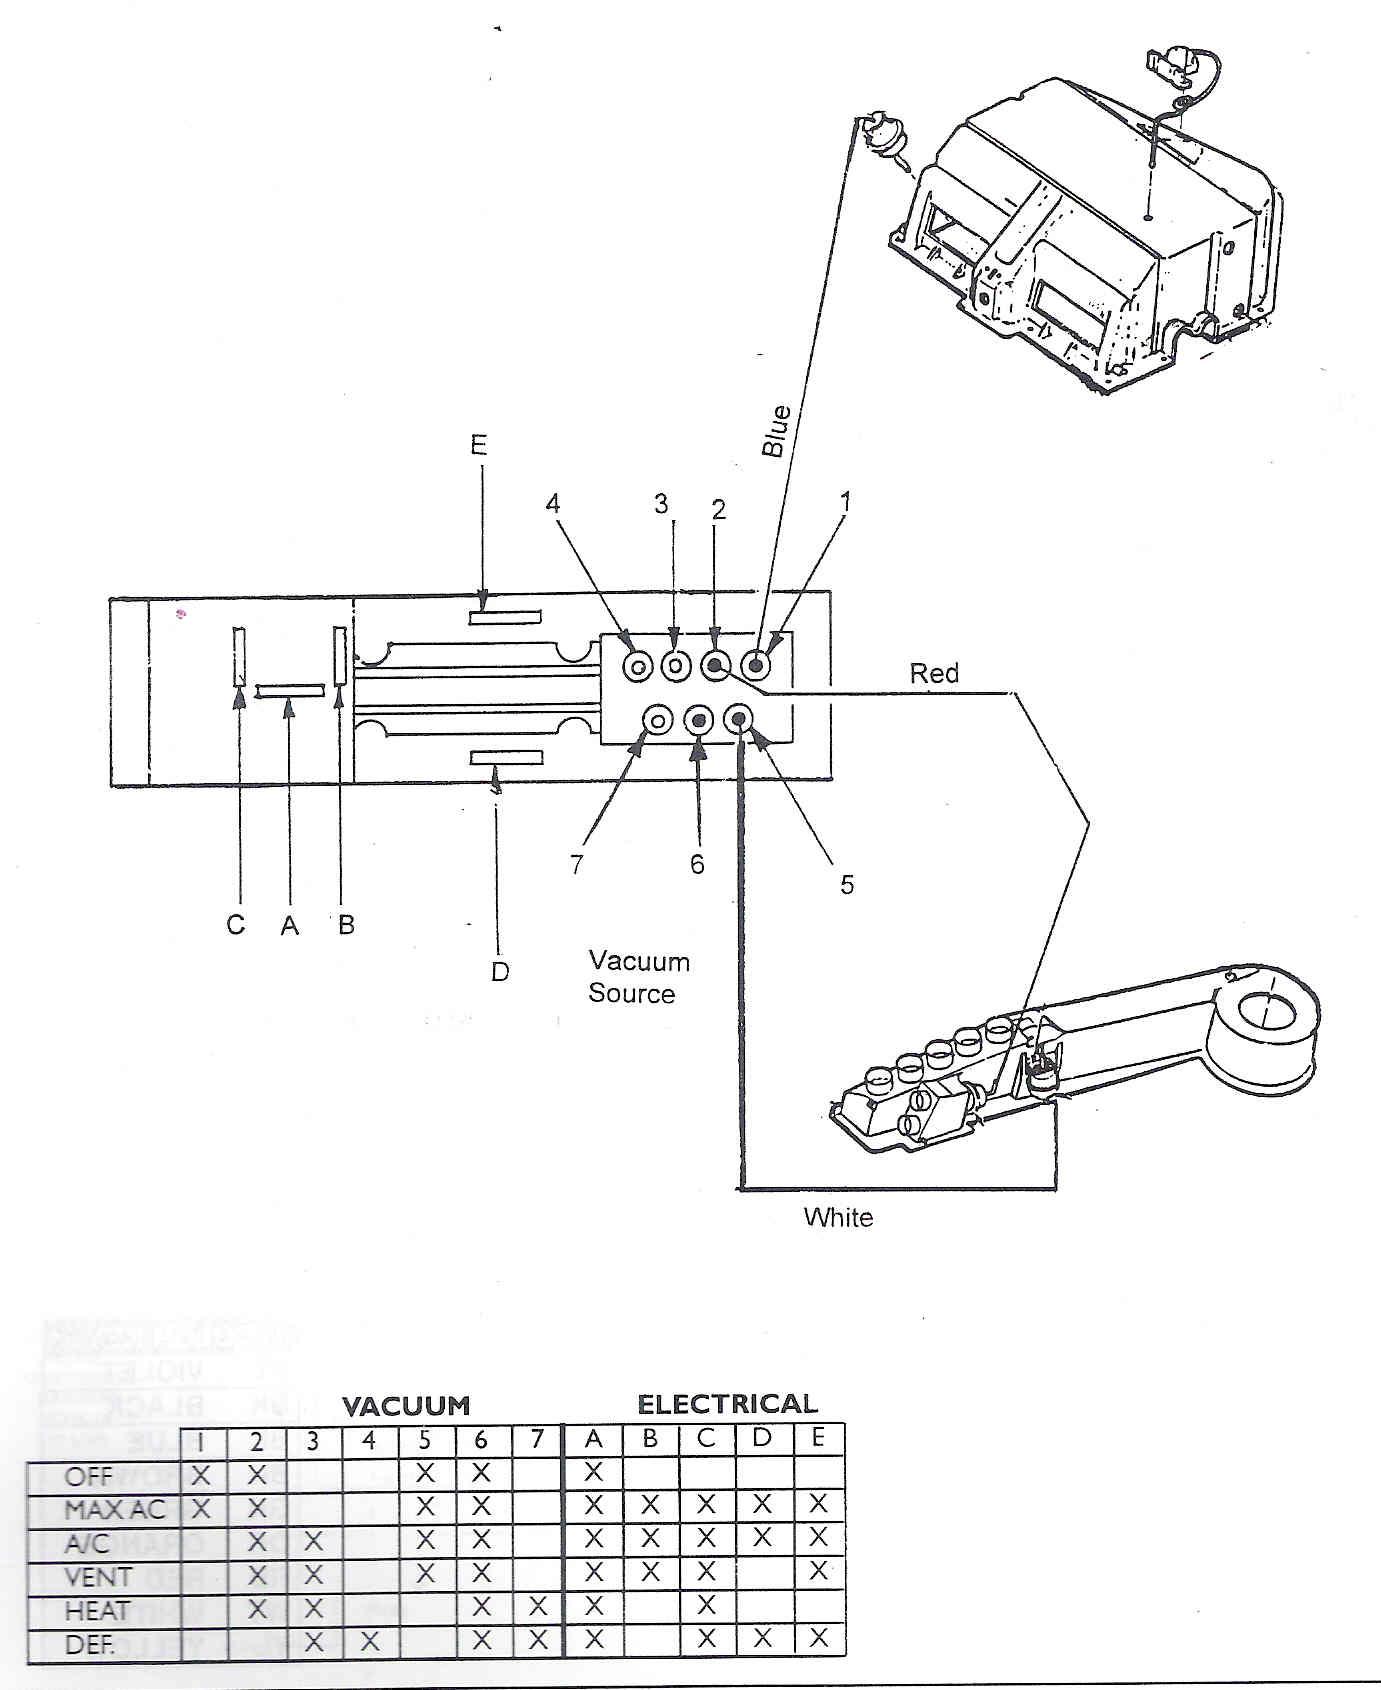 793983ab 85e2 4e39 bd24 870b95aca90b_2013 04 03_232313_vacuum_heater_control need diagram of vacuum hoses that go into dash heater control, 1983